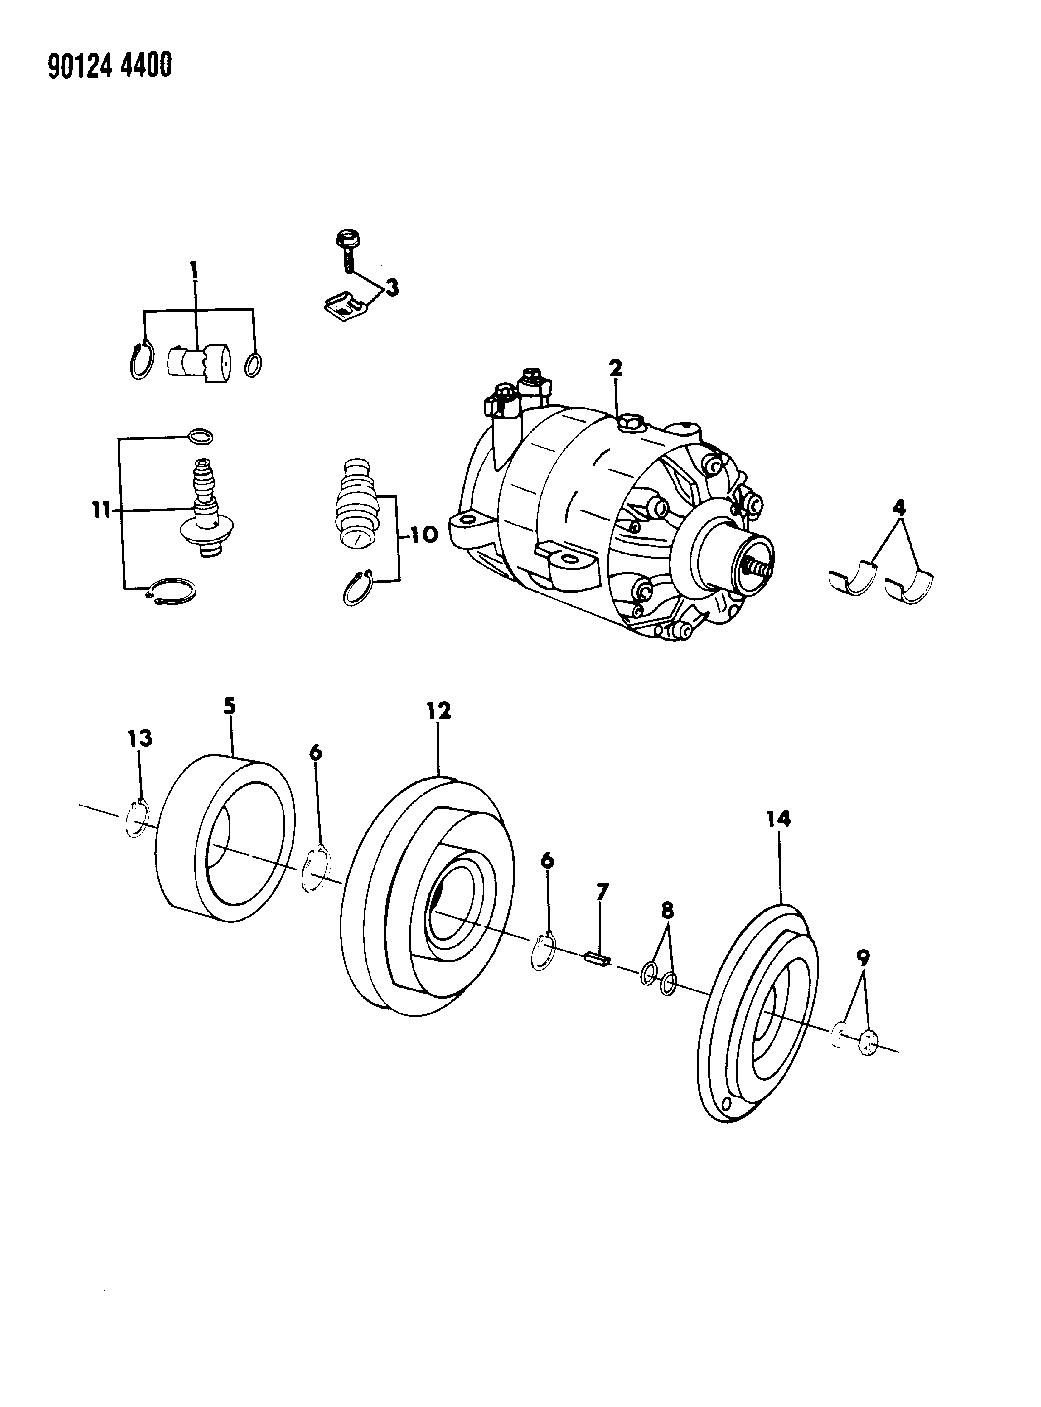 1990 Chrysler Imperial A C Compressor Mopar Parts Giant Wiring Diagram